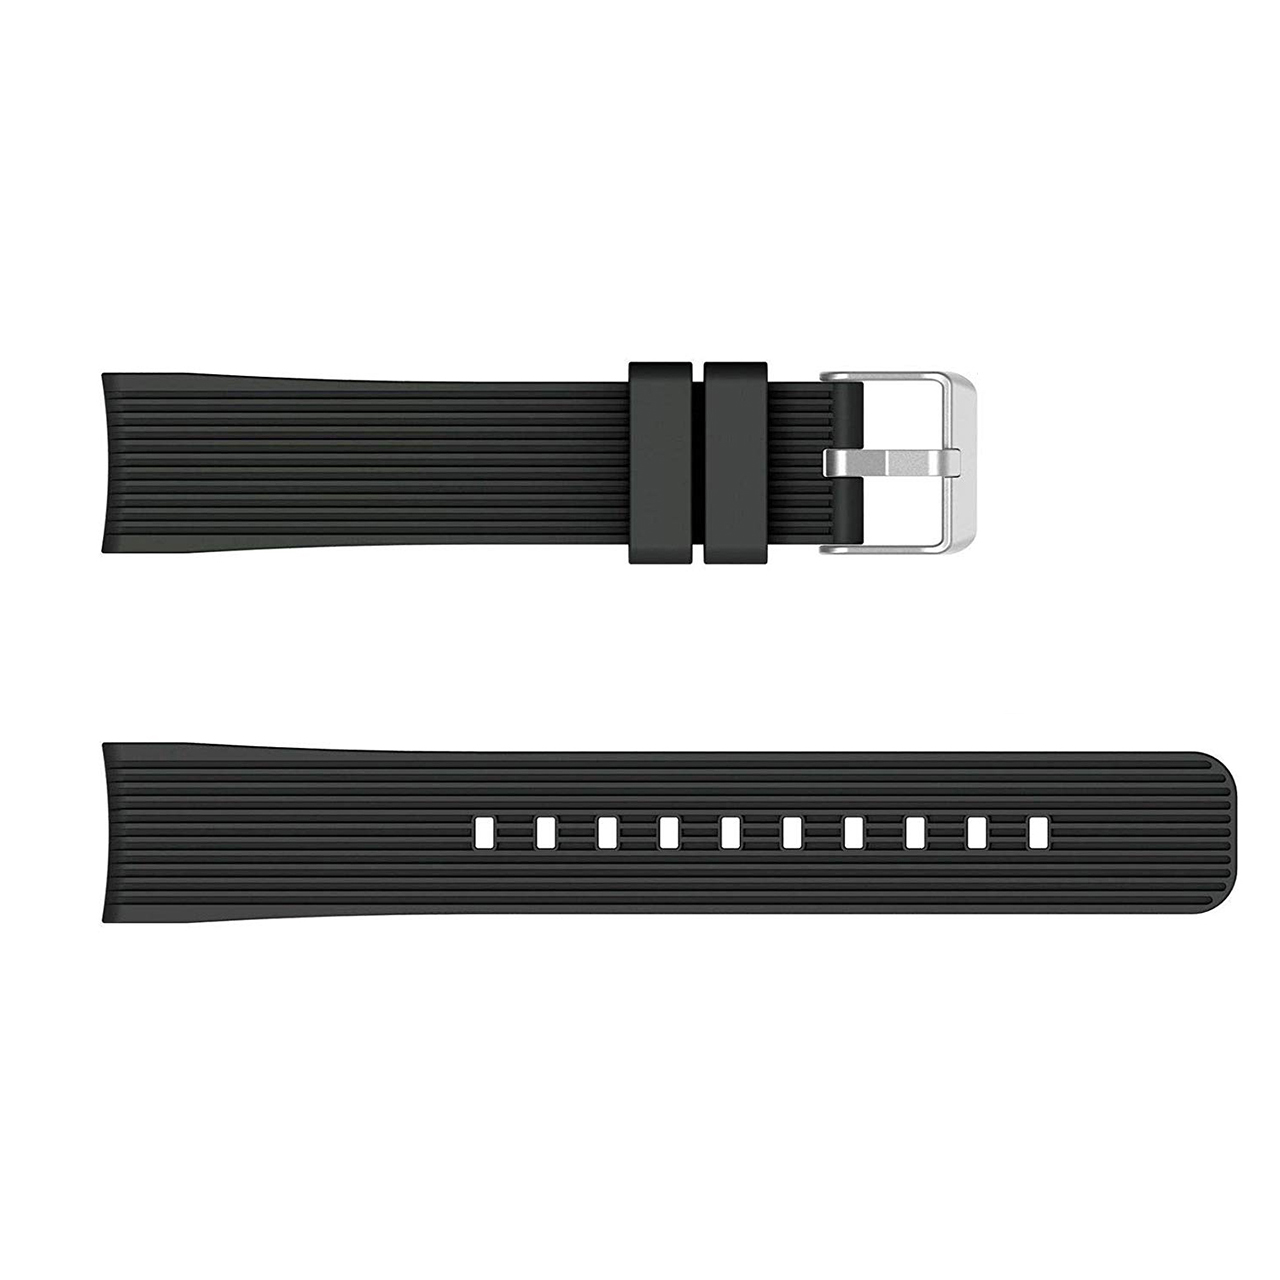 بند مدل Stripes مناسب برای ساعت هوشمند سامسونگ  Gear S2 Classic / Gear Sport / Galaxy Watch 42mm